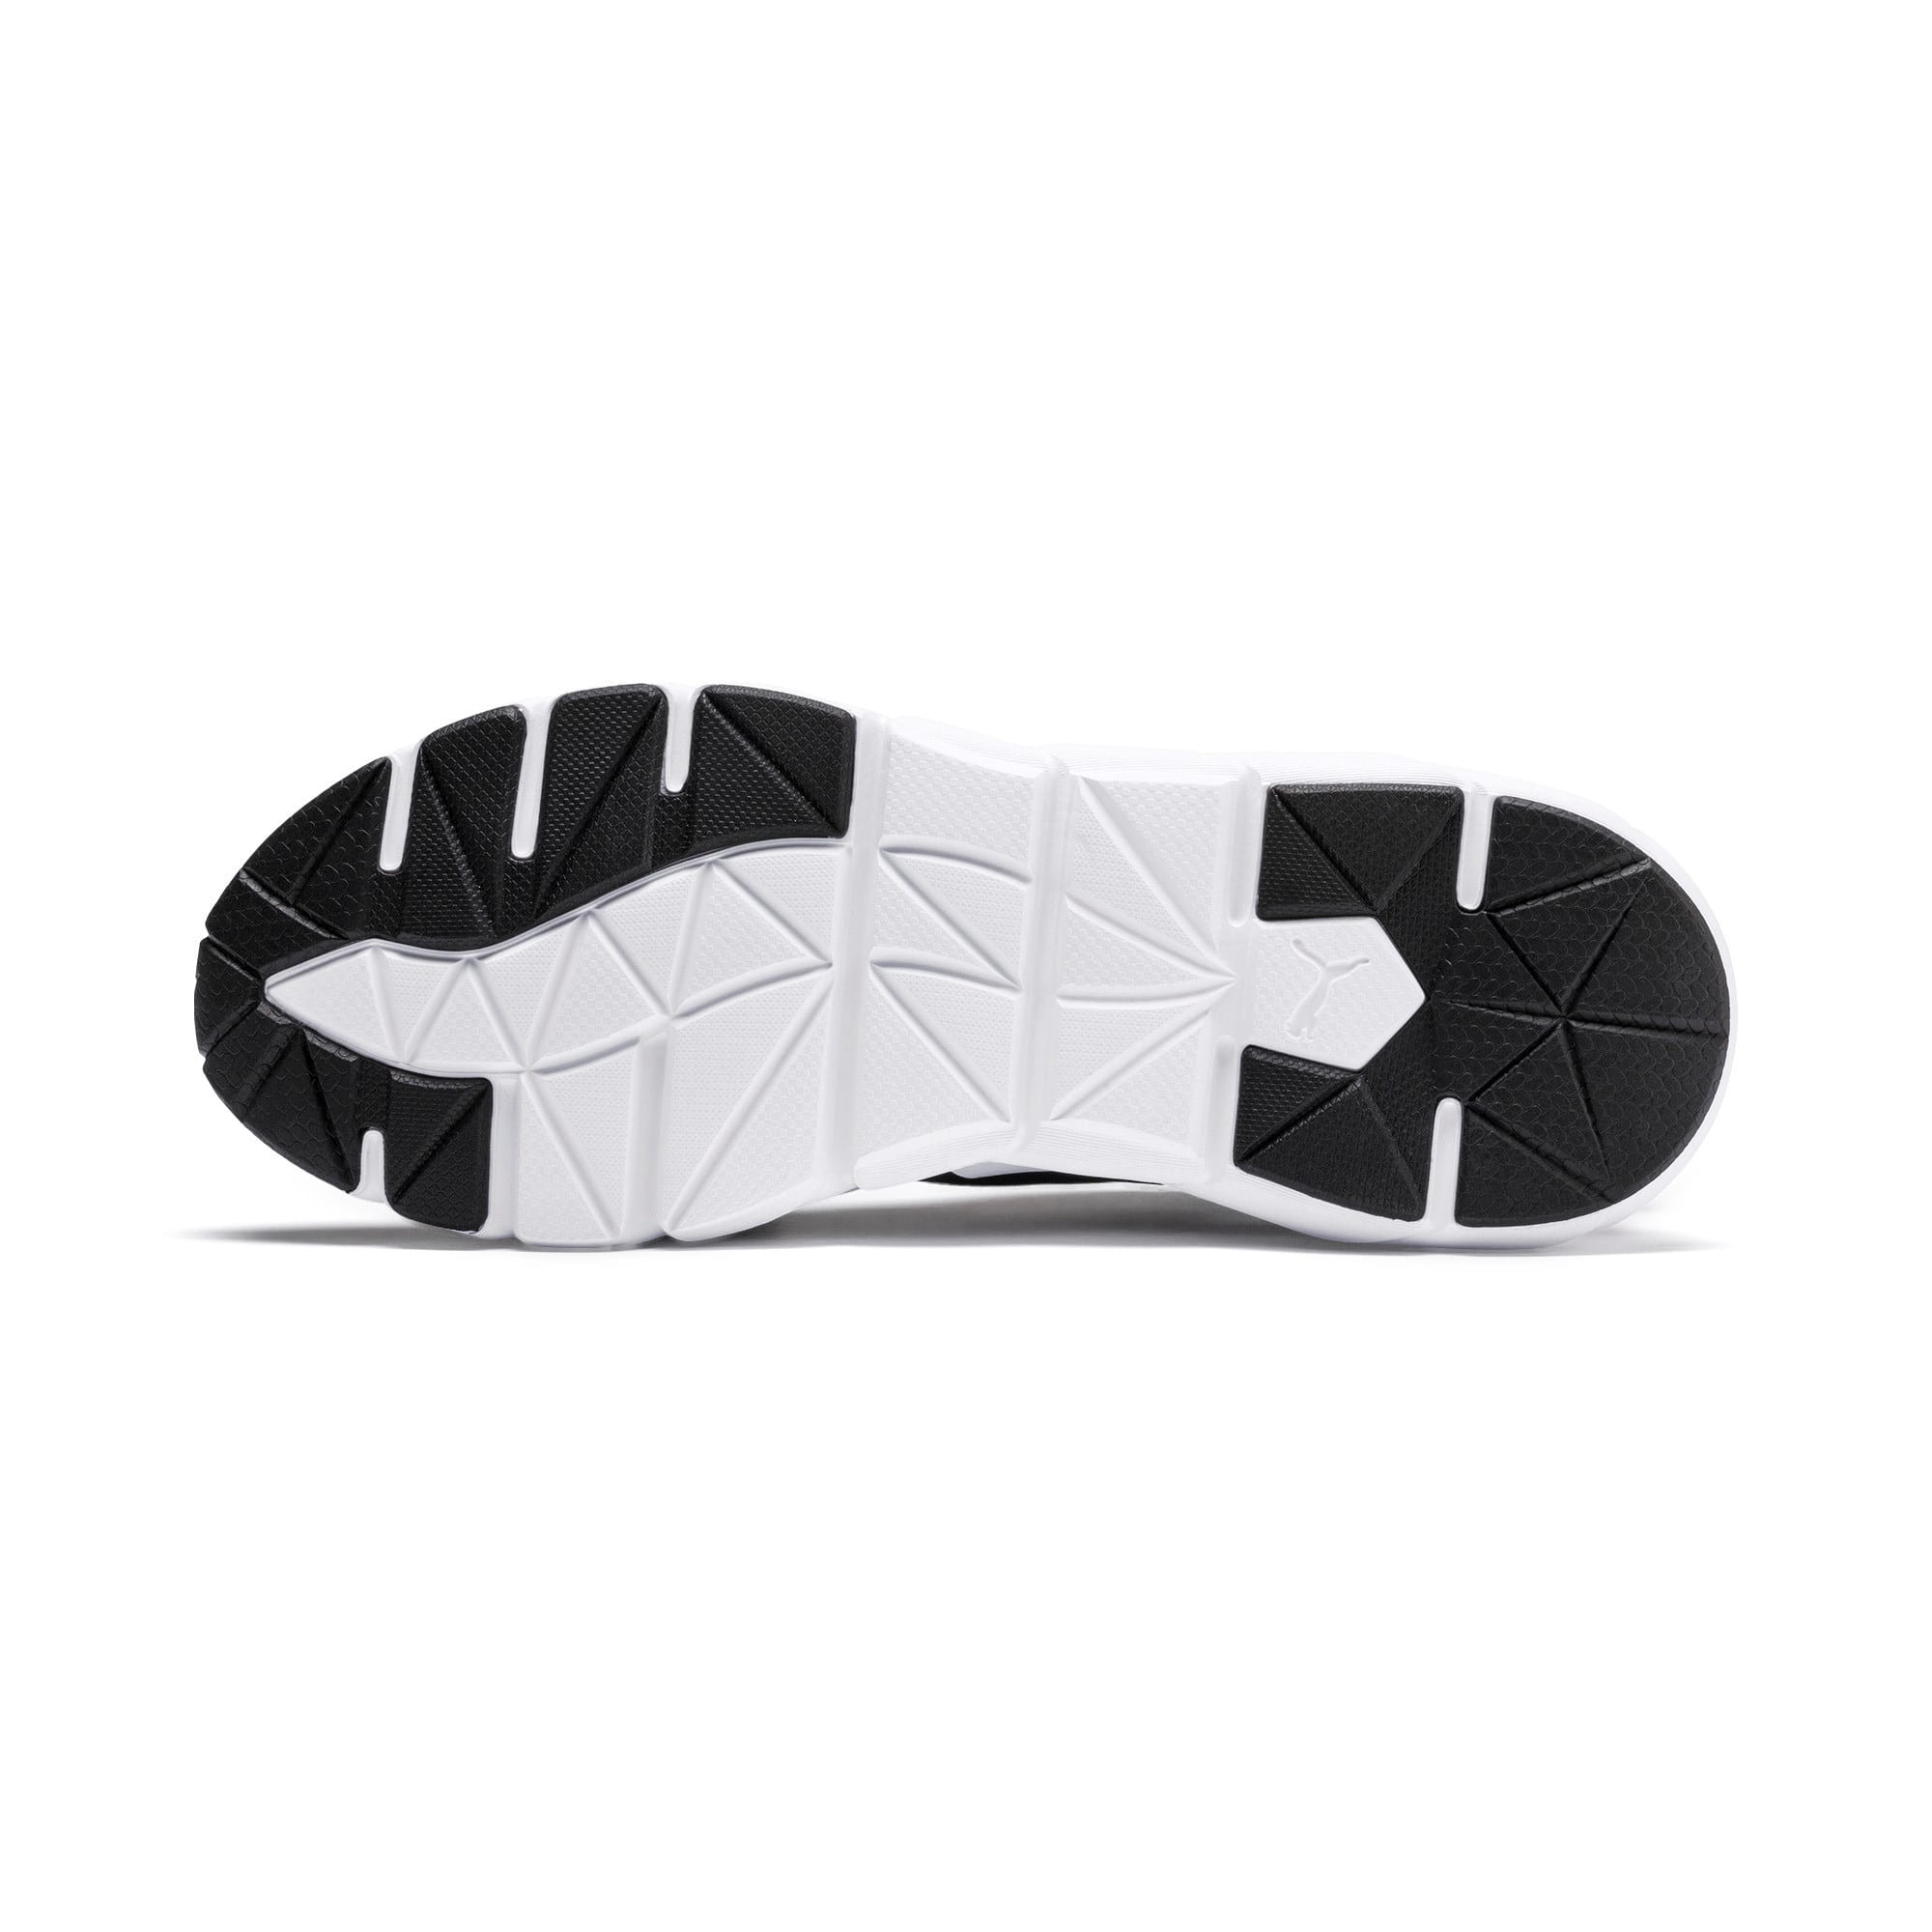 Thumbnail 3 of Weave XT Training Shoes JR, Black-White-Calypso Coral, medium